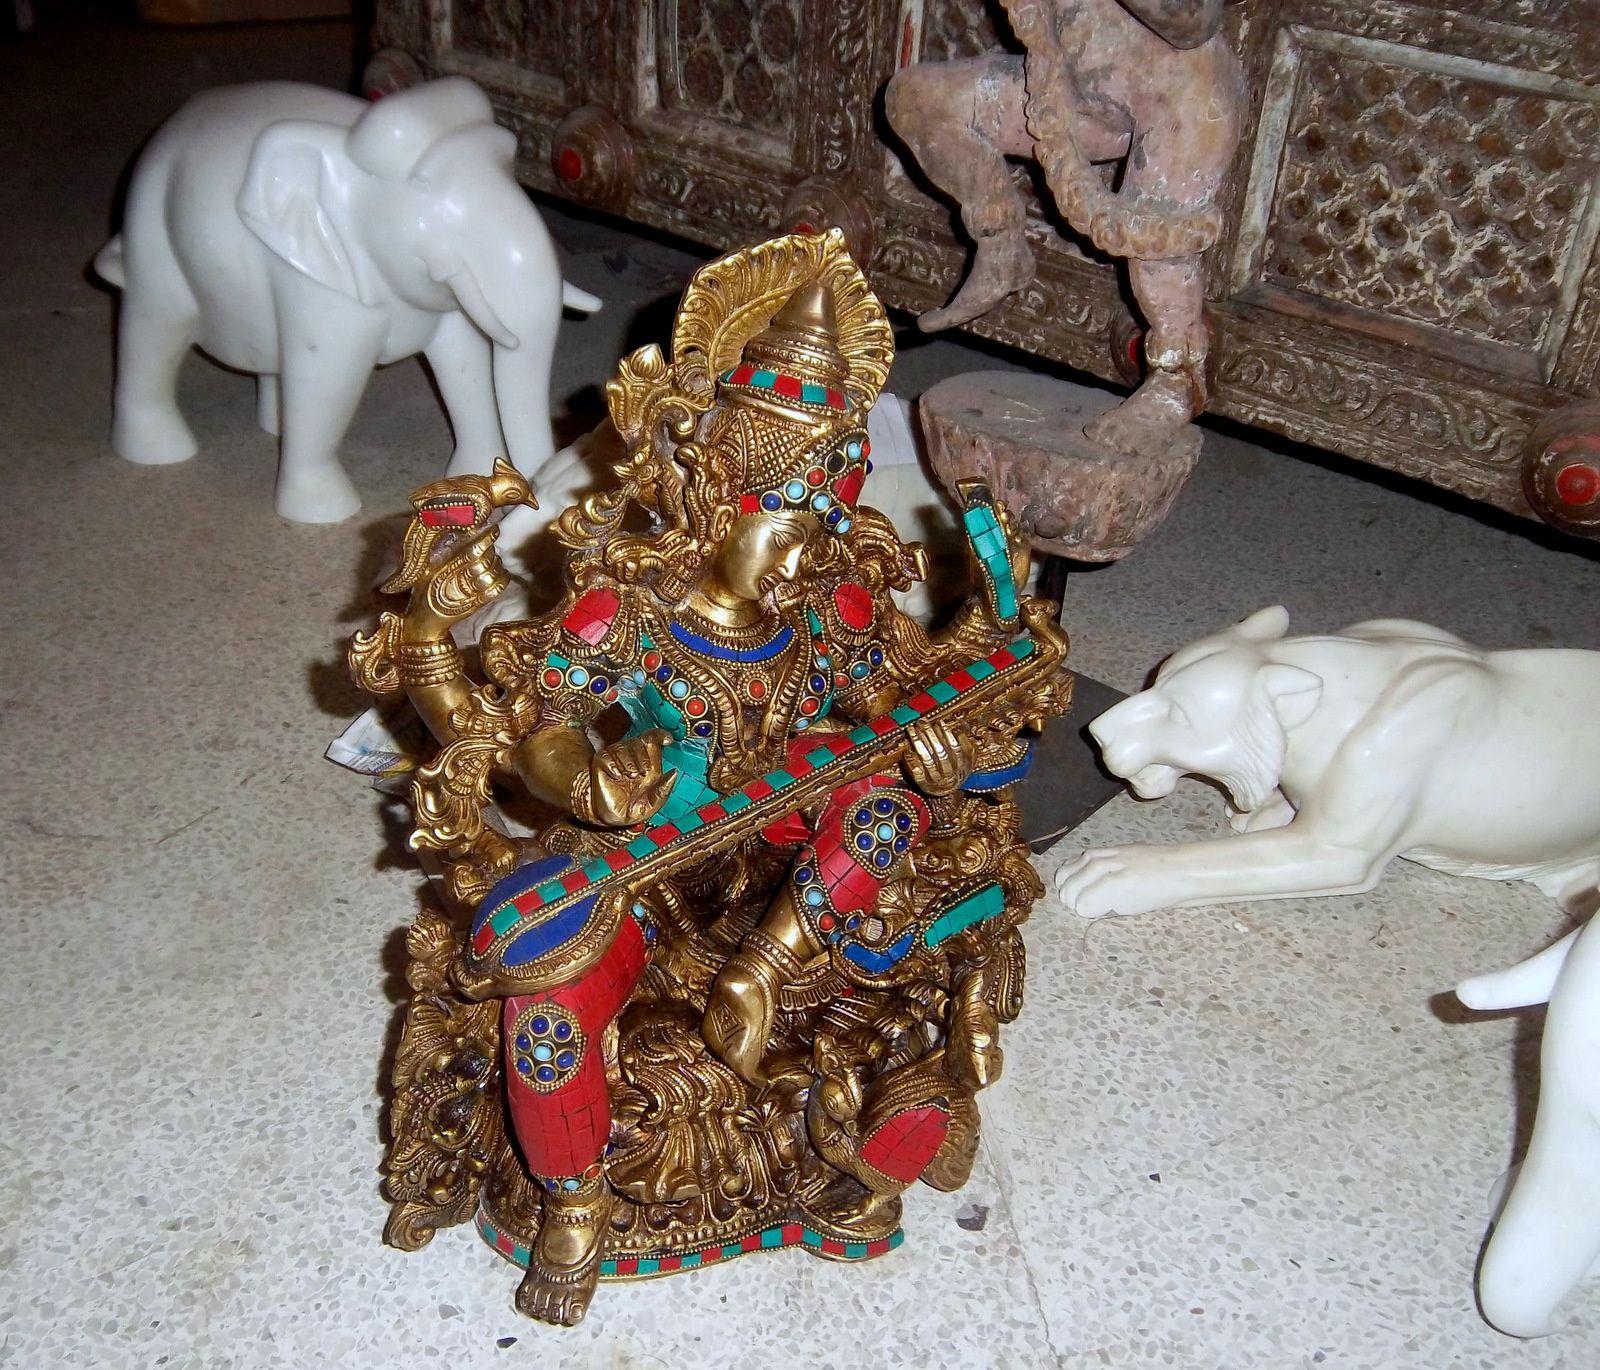 Maharani Textile (sculptures et objets divers, 2/2), Jodhpur (Inde)